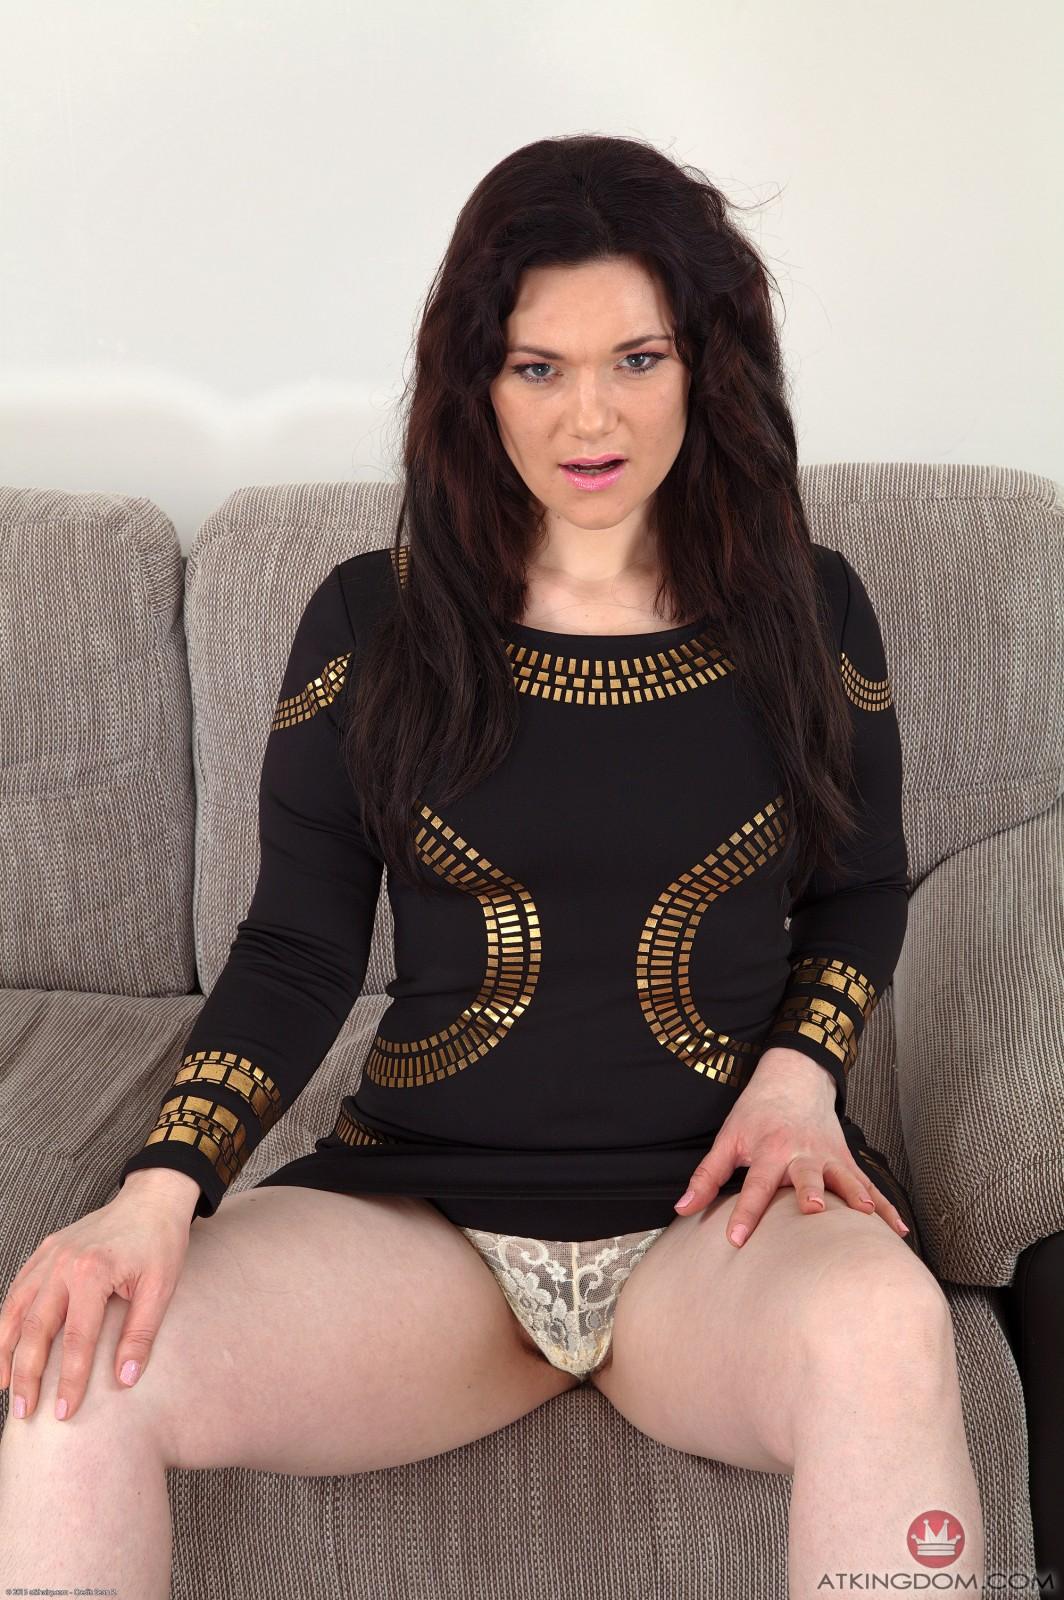 Danielle Hairy 15